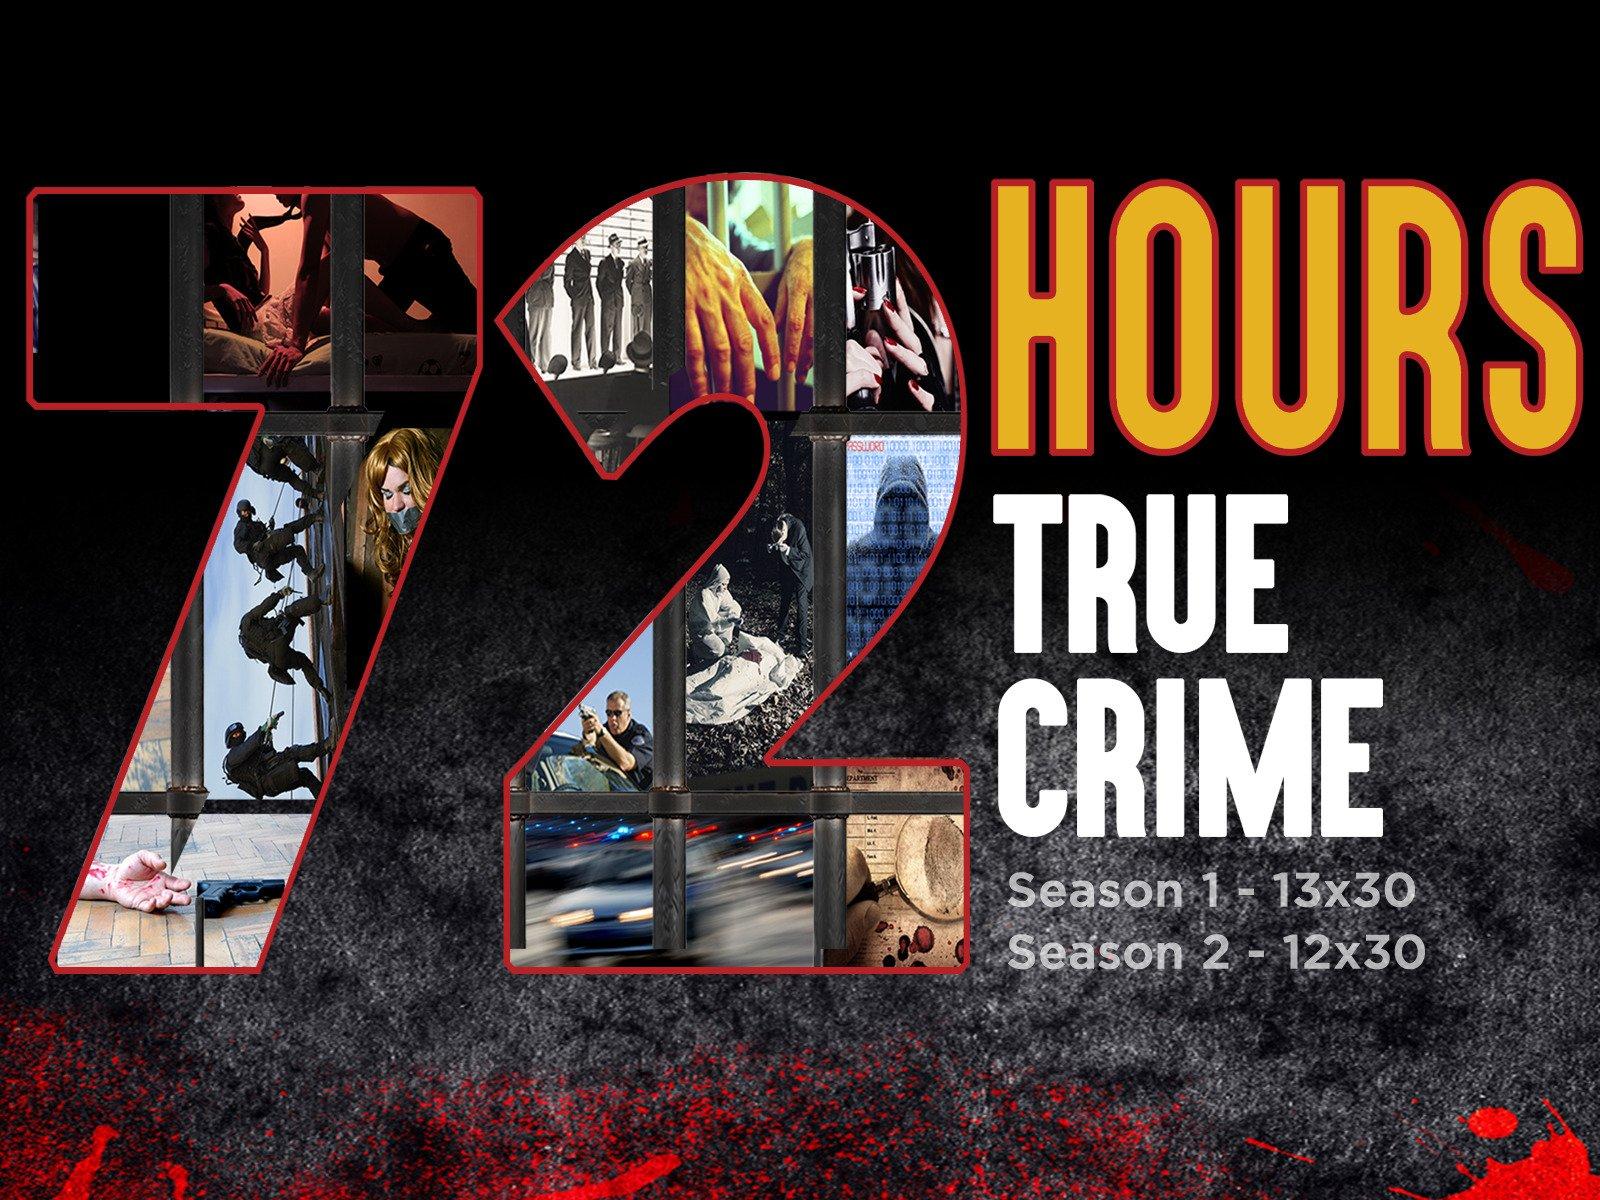 72 Hours - Season 2